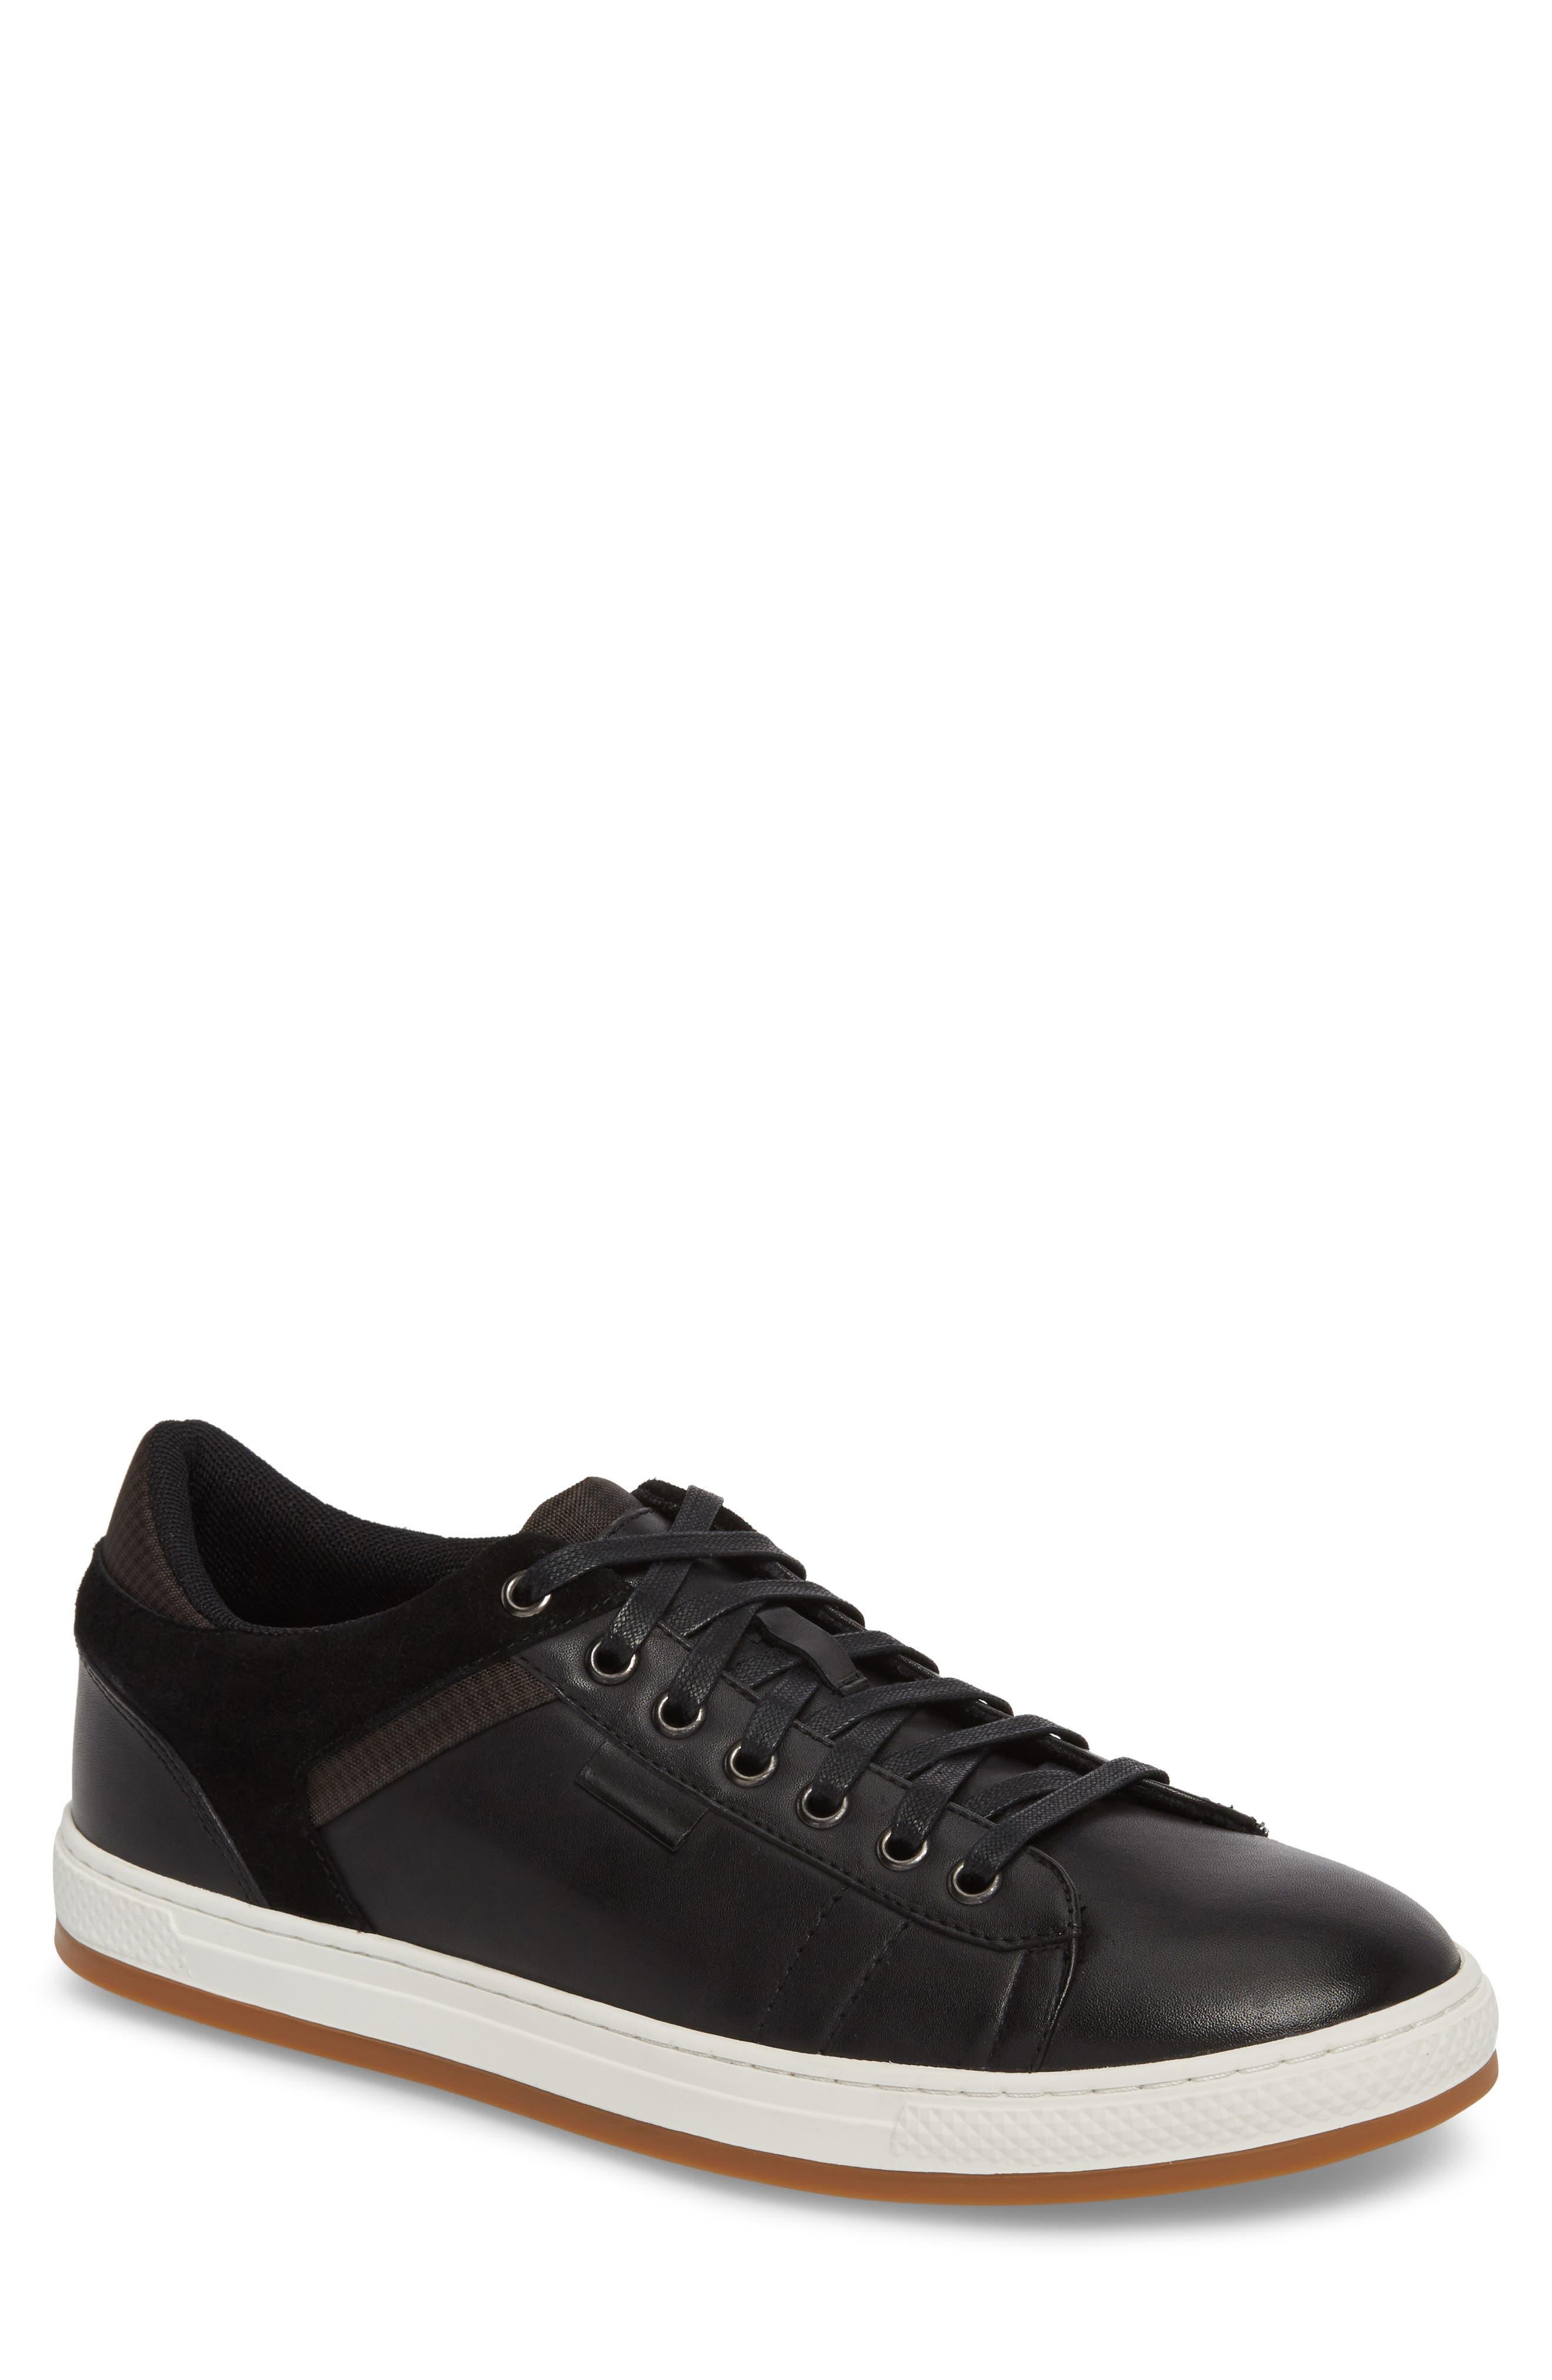 Ireton Low Top Sneaker,                             Main thumbnail 1, color,                             BLACK LEATHER/ SUEDE